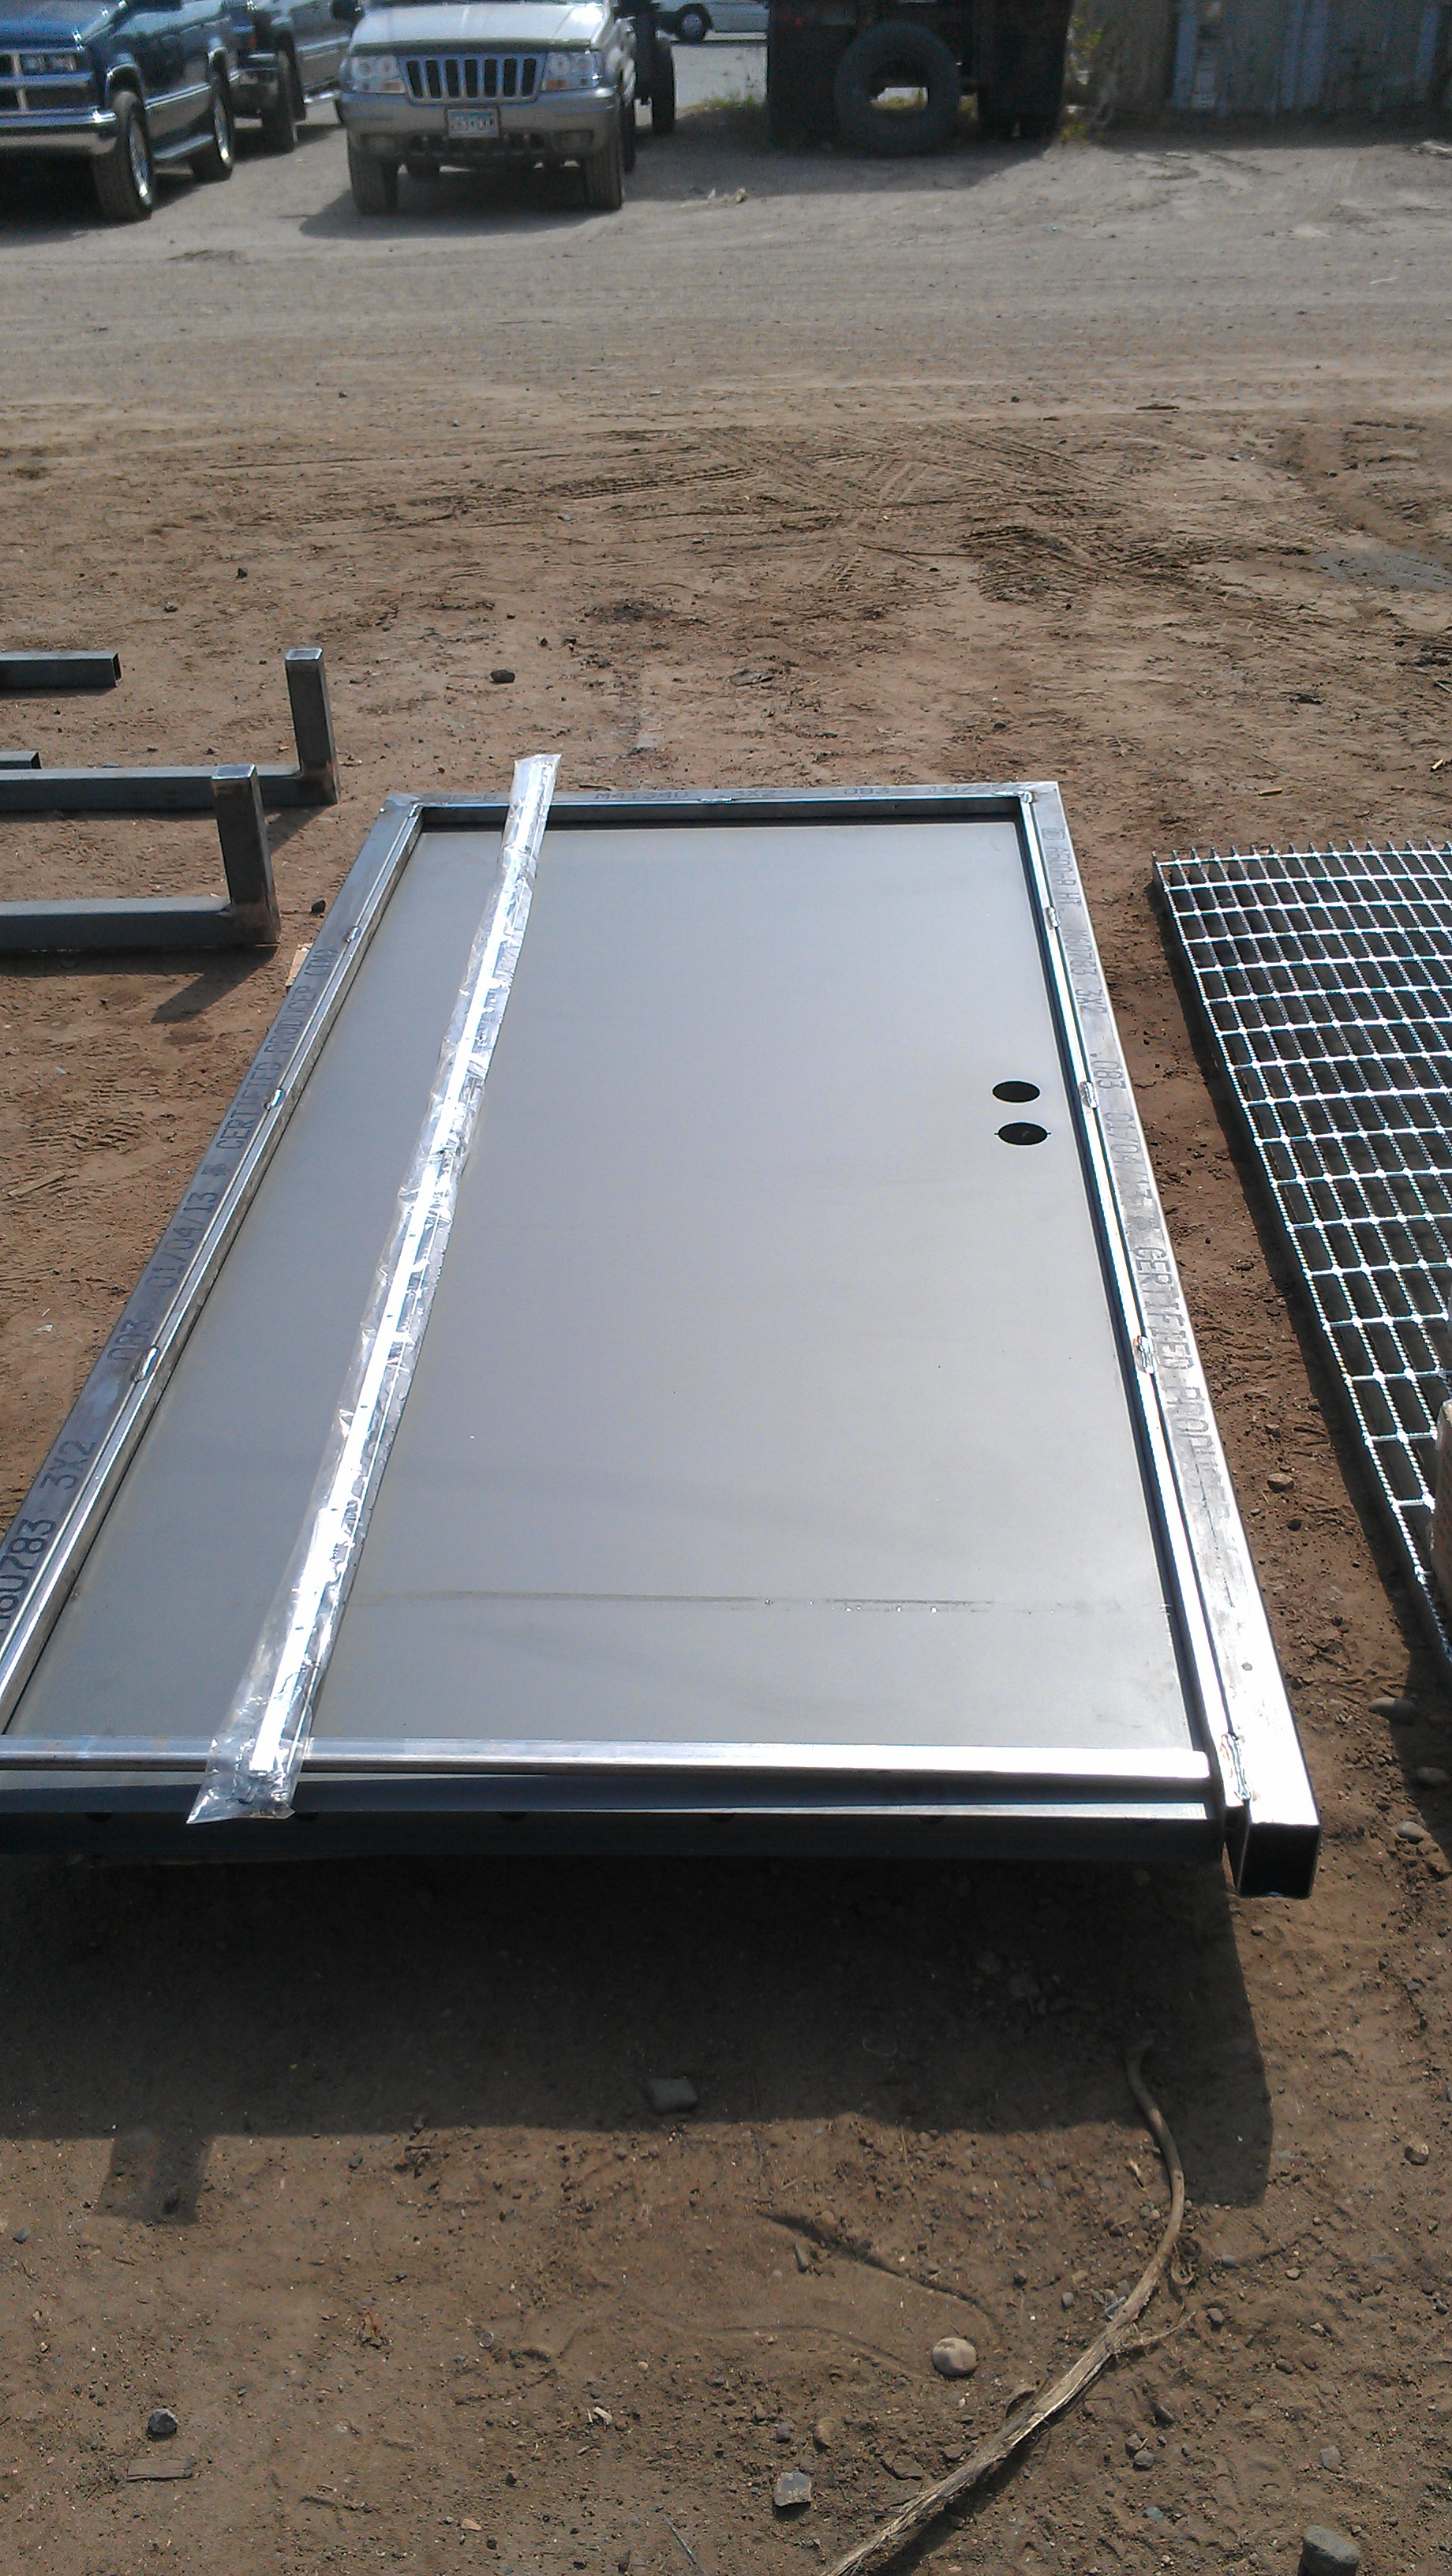 Man-door kit before installation